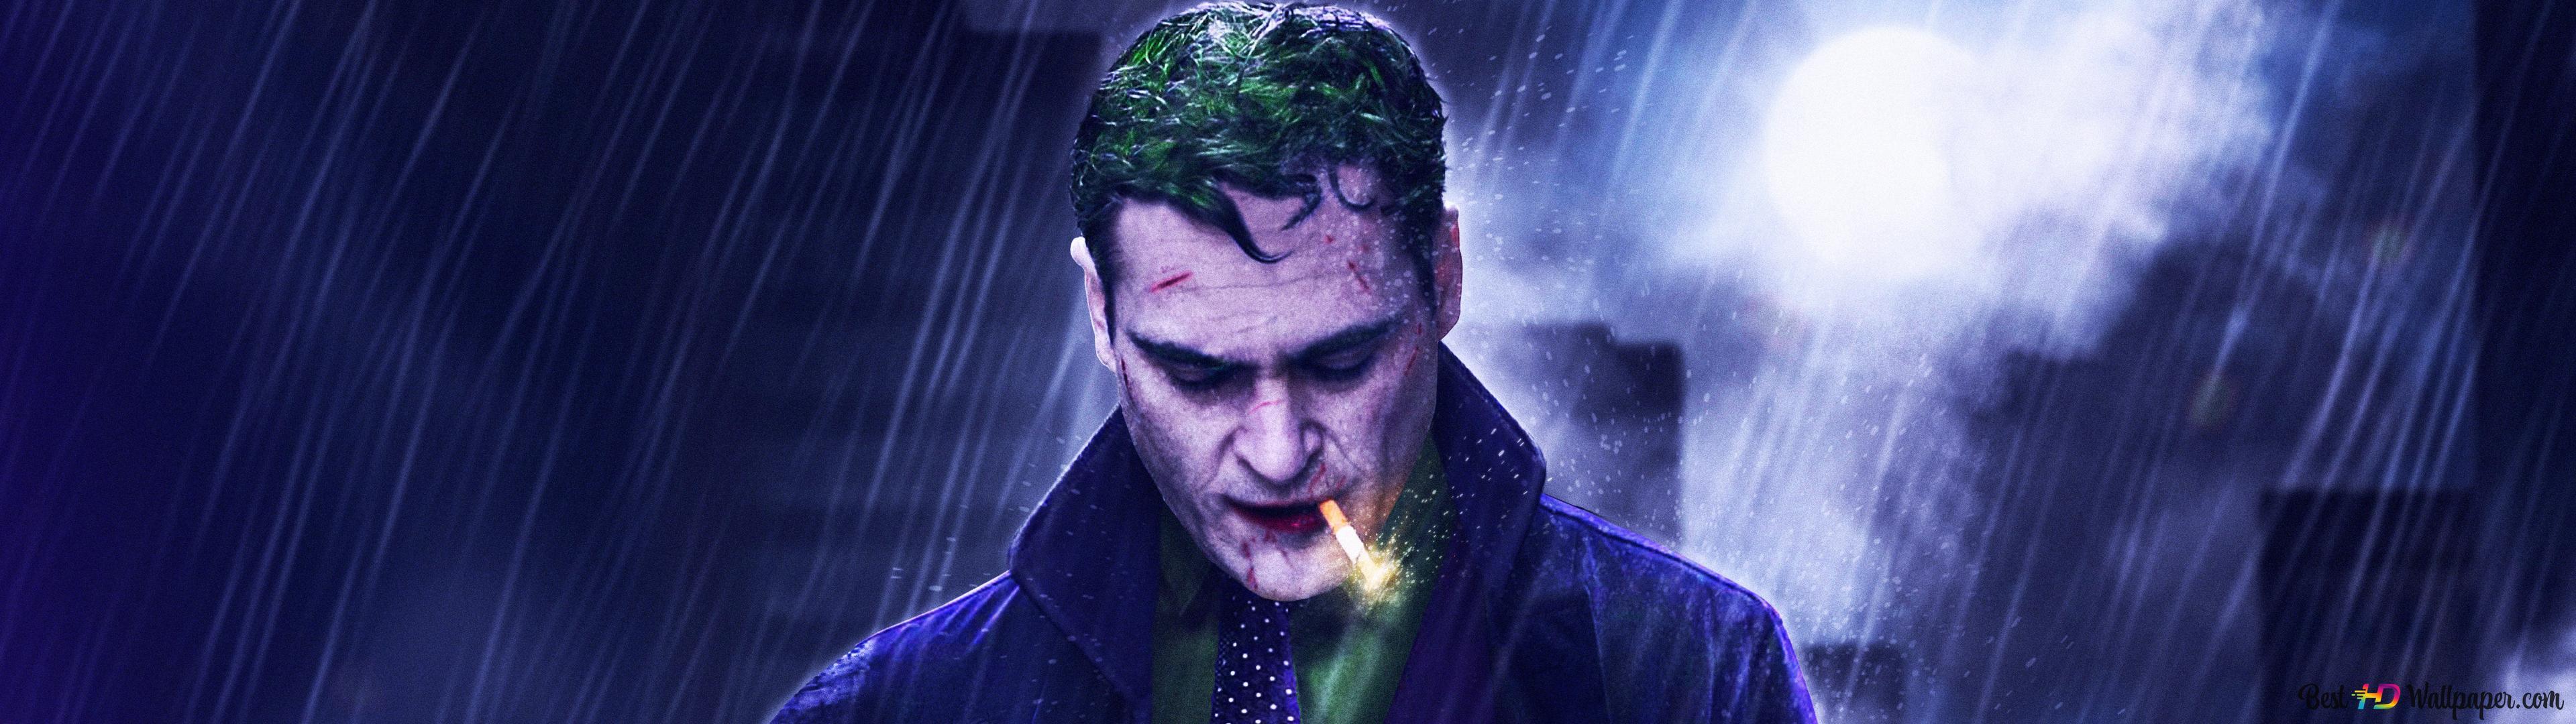 Joker In Klassischem Lila Anzug Hd Hintergrundbilder